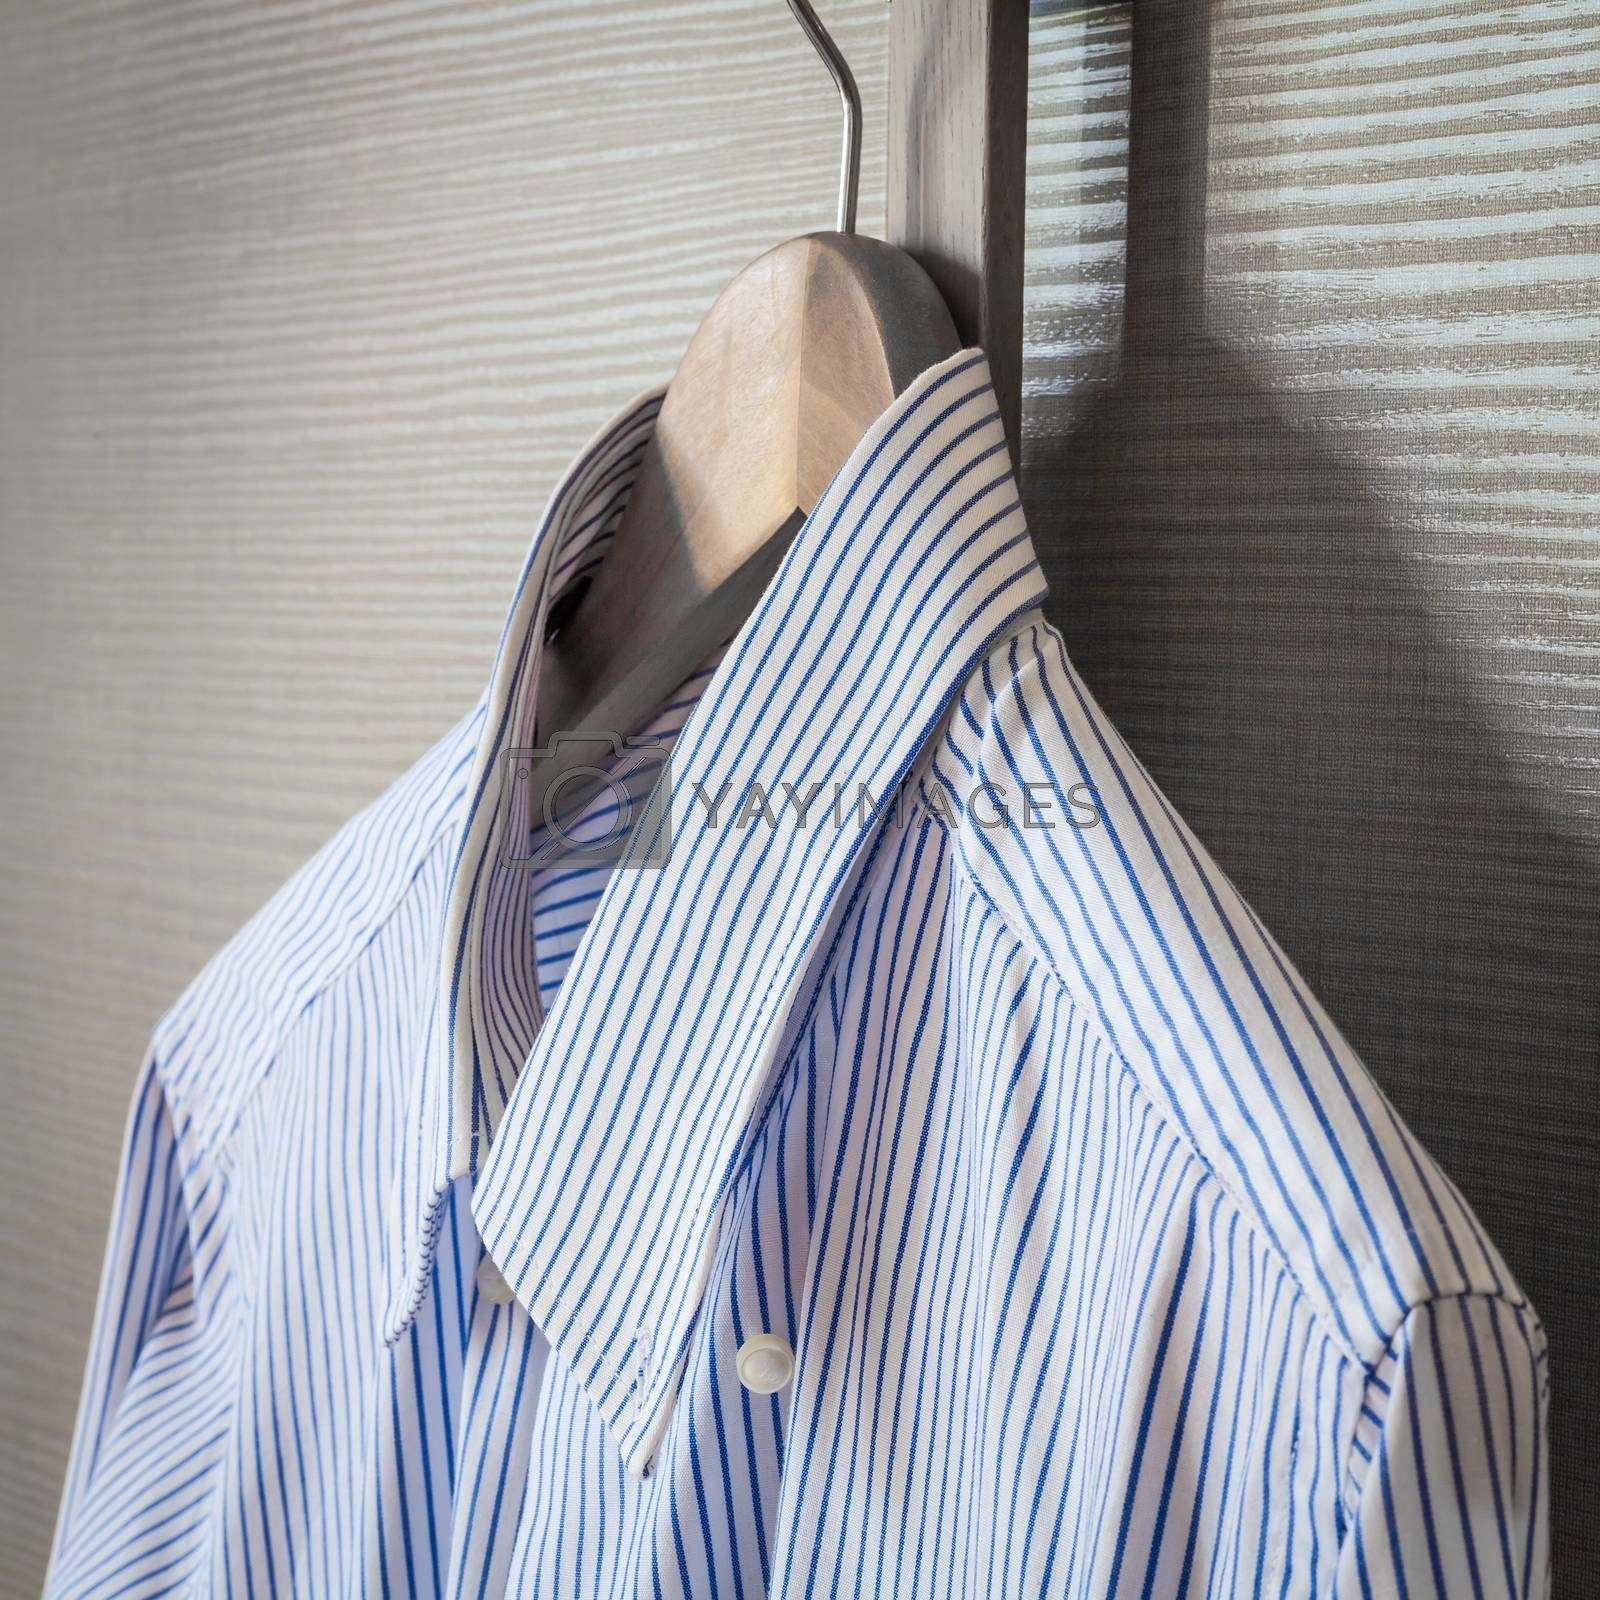 Italian fashion - business shirt, classical dresscode, ready for a business trip.